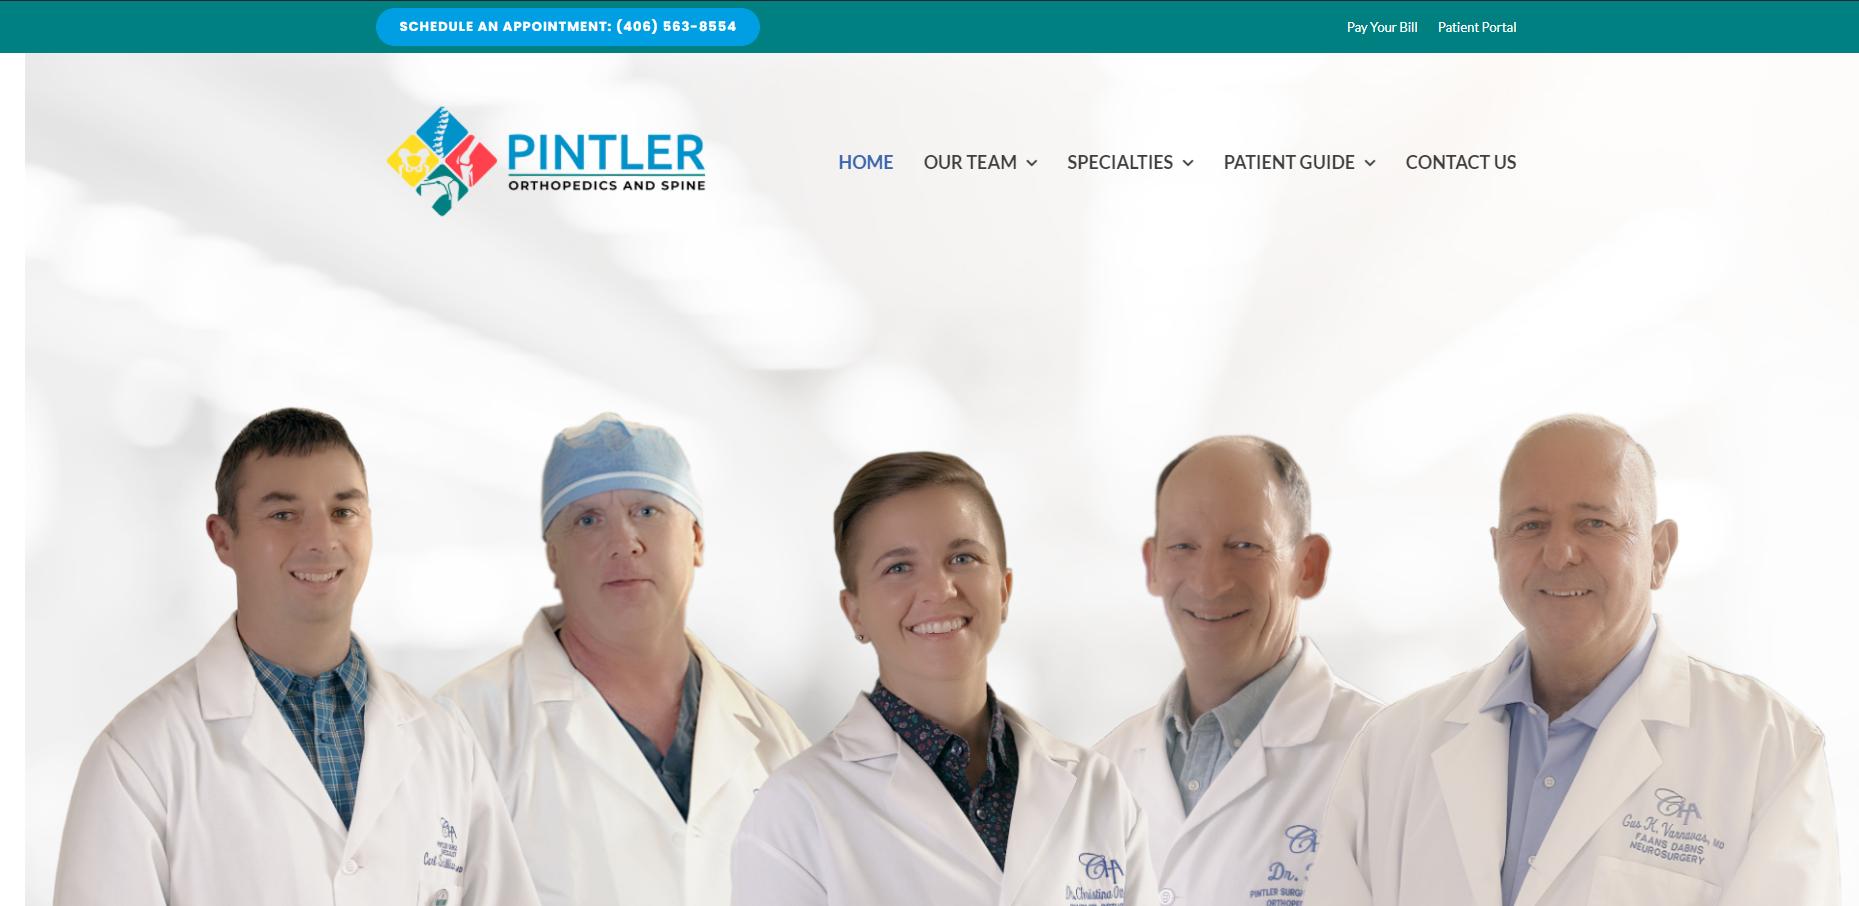 Pintler Orthopedics and Spine – Anaconda, Montana